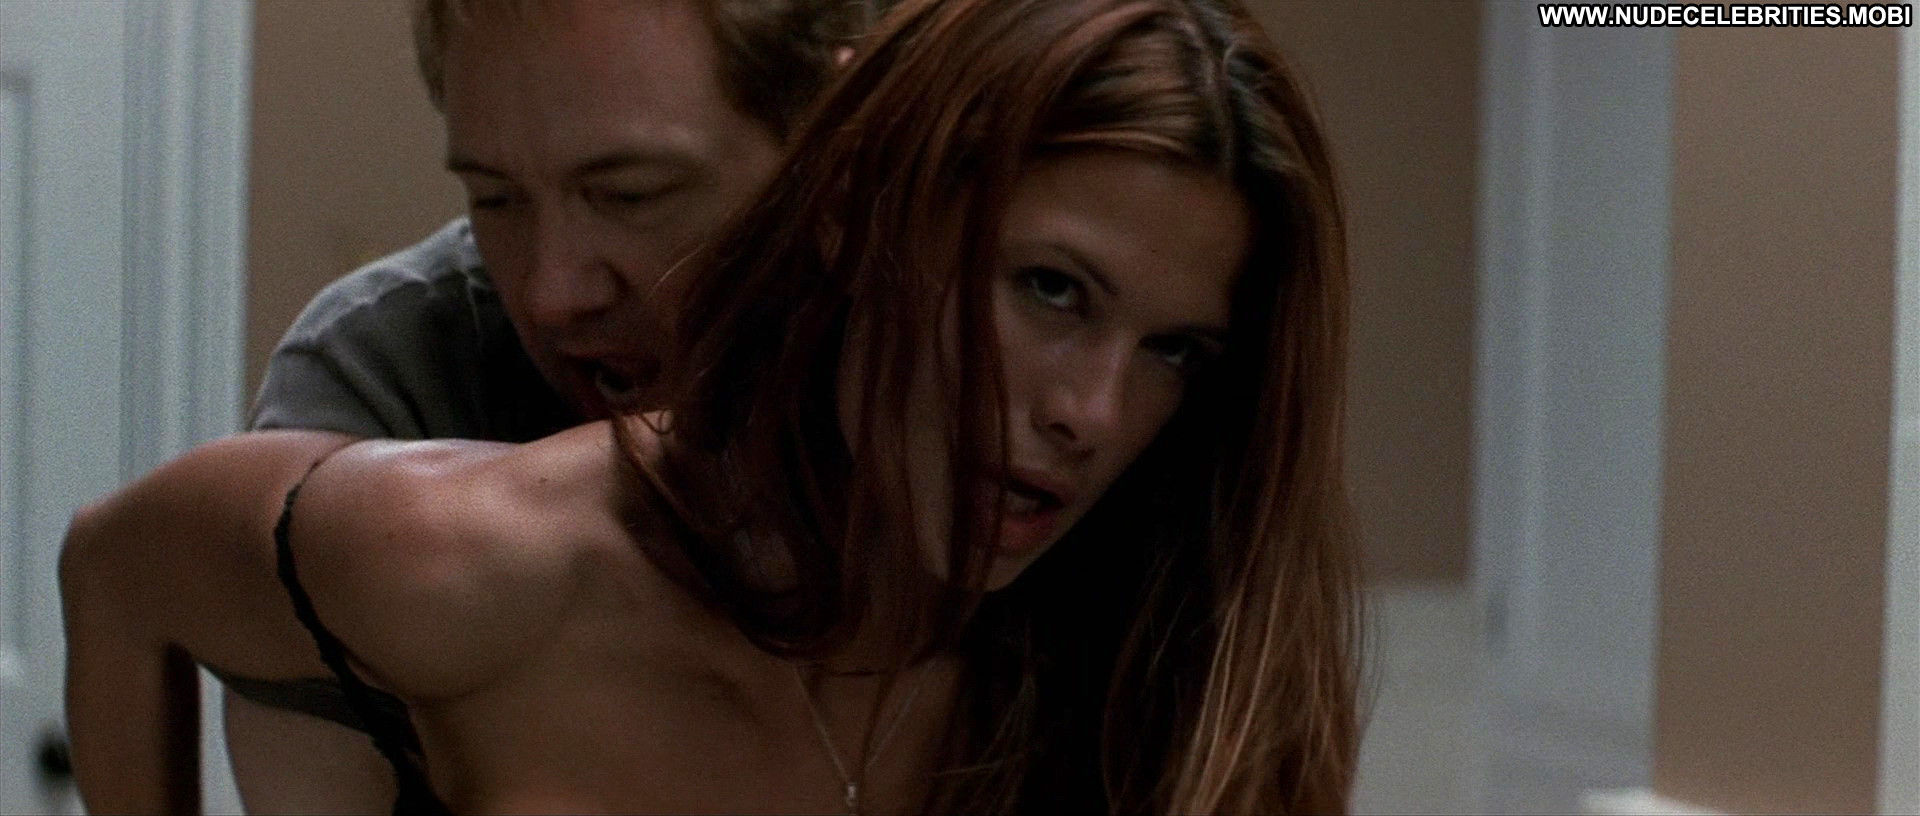 Cyrus pussy rhona mitra sex scene video latinos masturbating